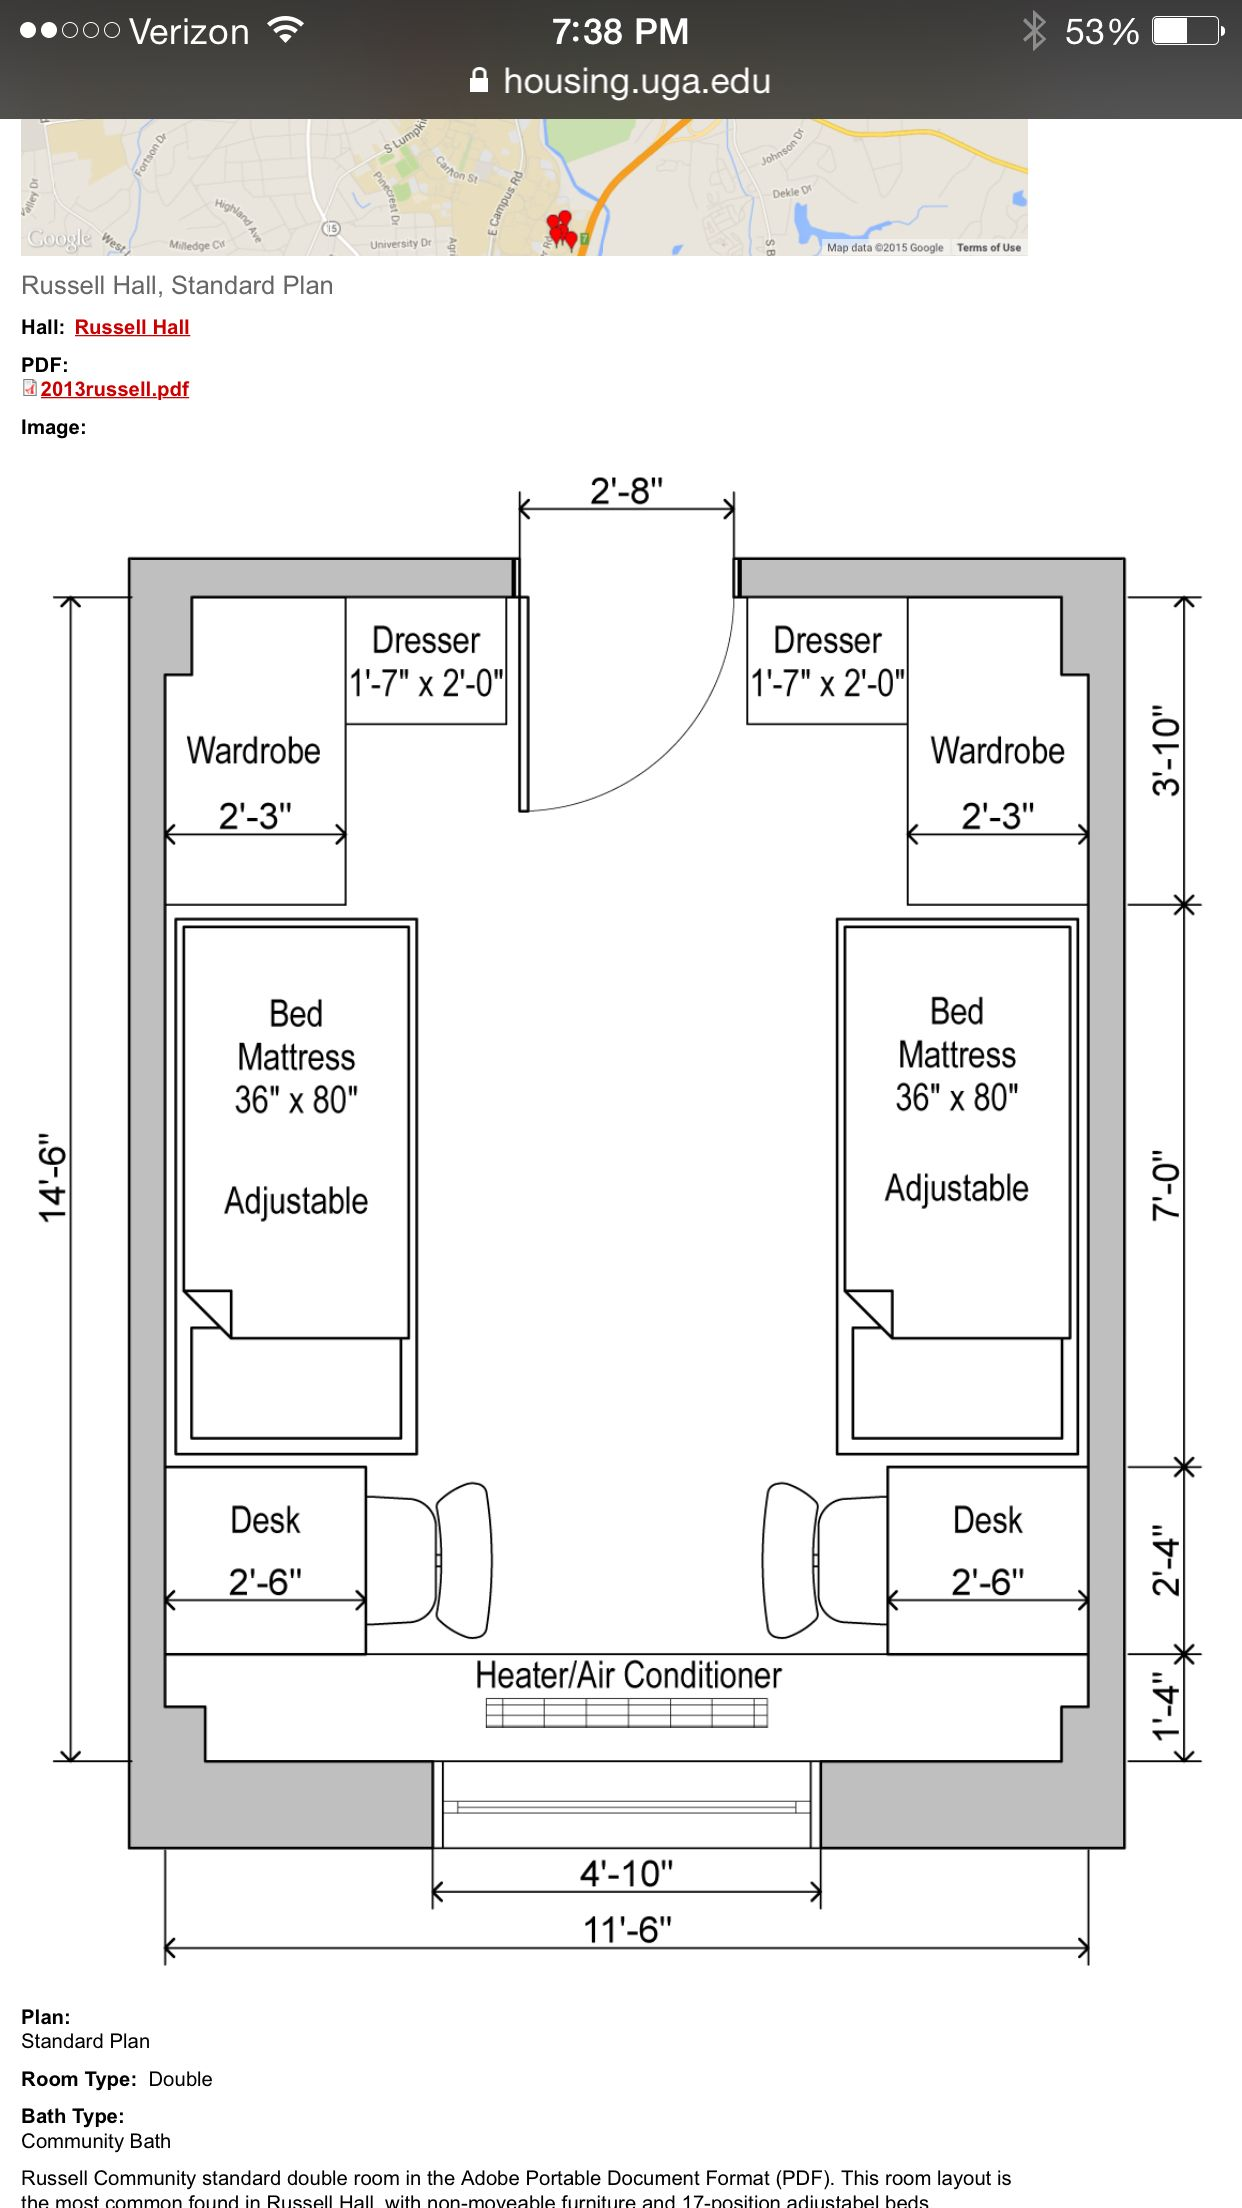 Dorm Room Plans: UGA Russell Hall Floor Plan